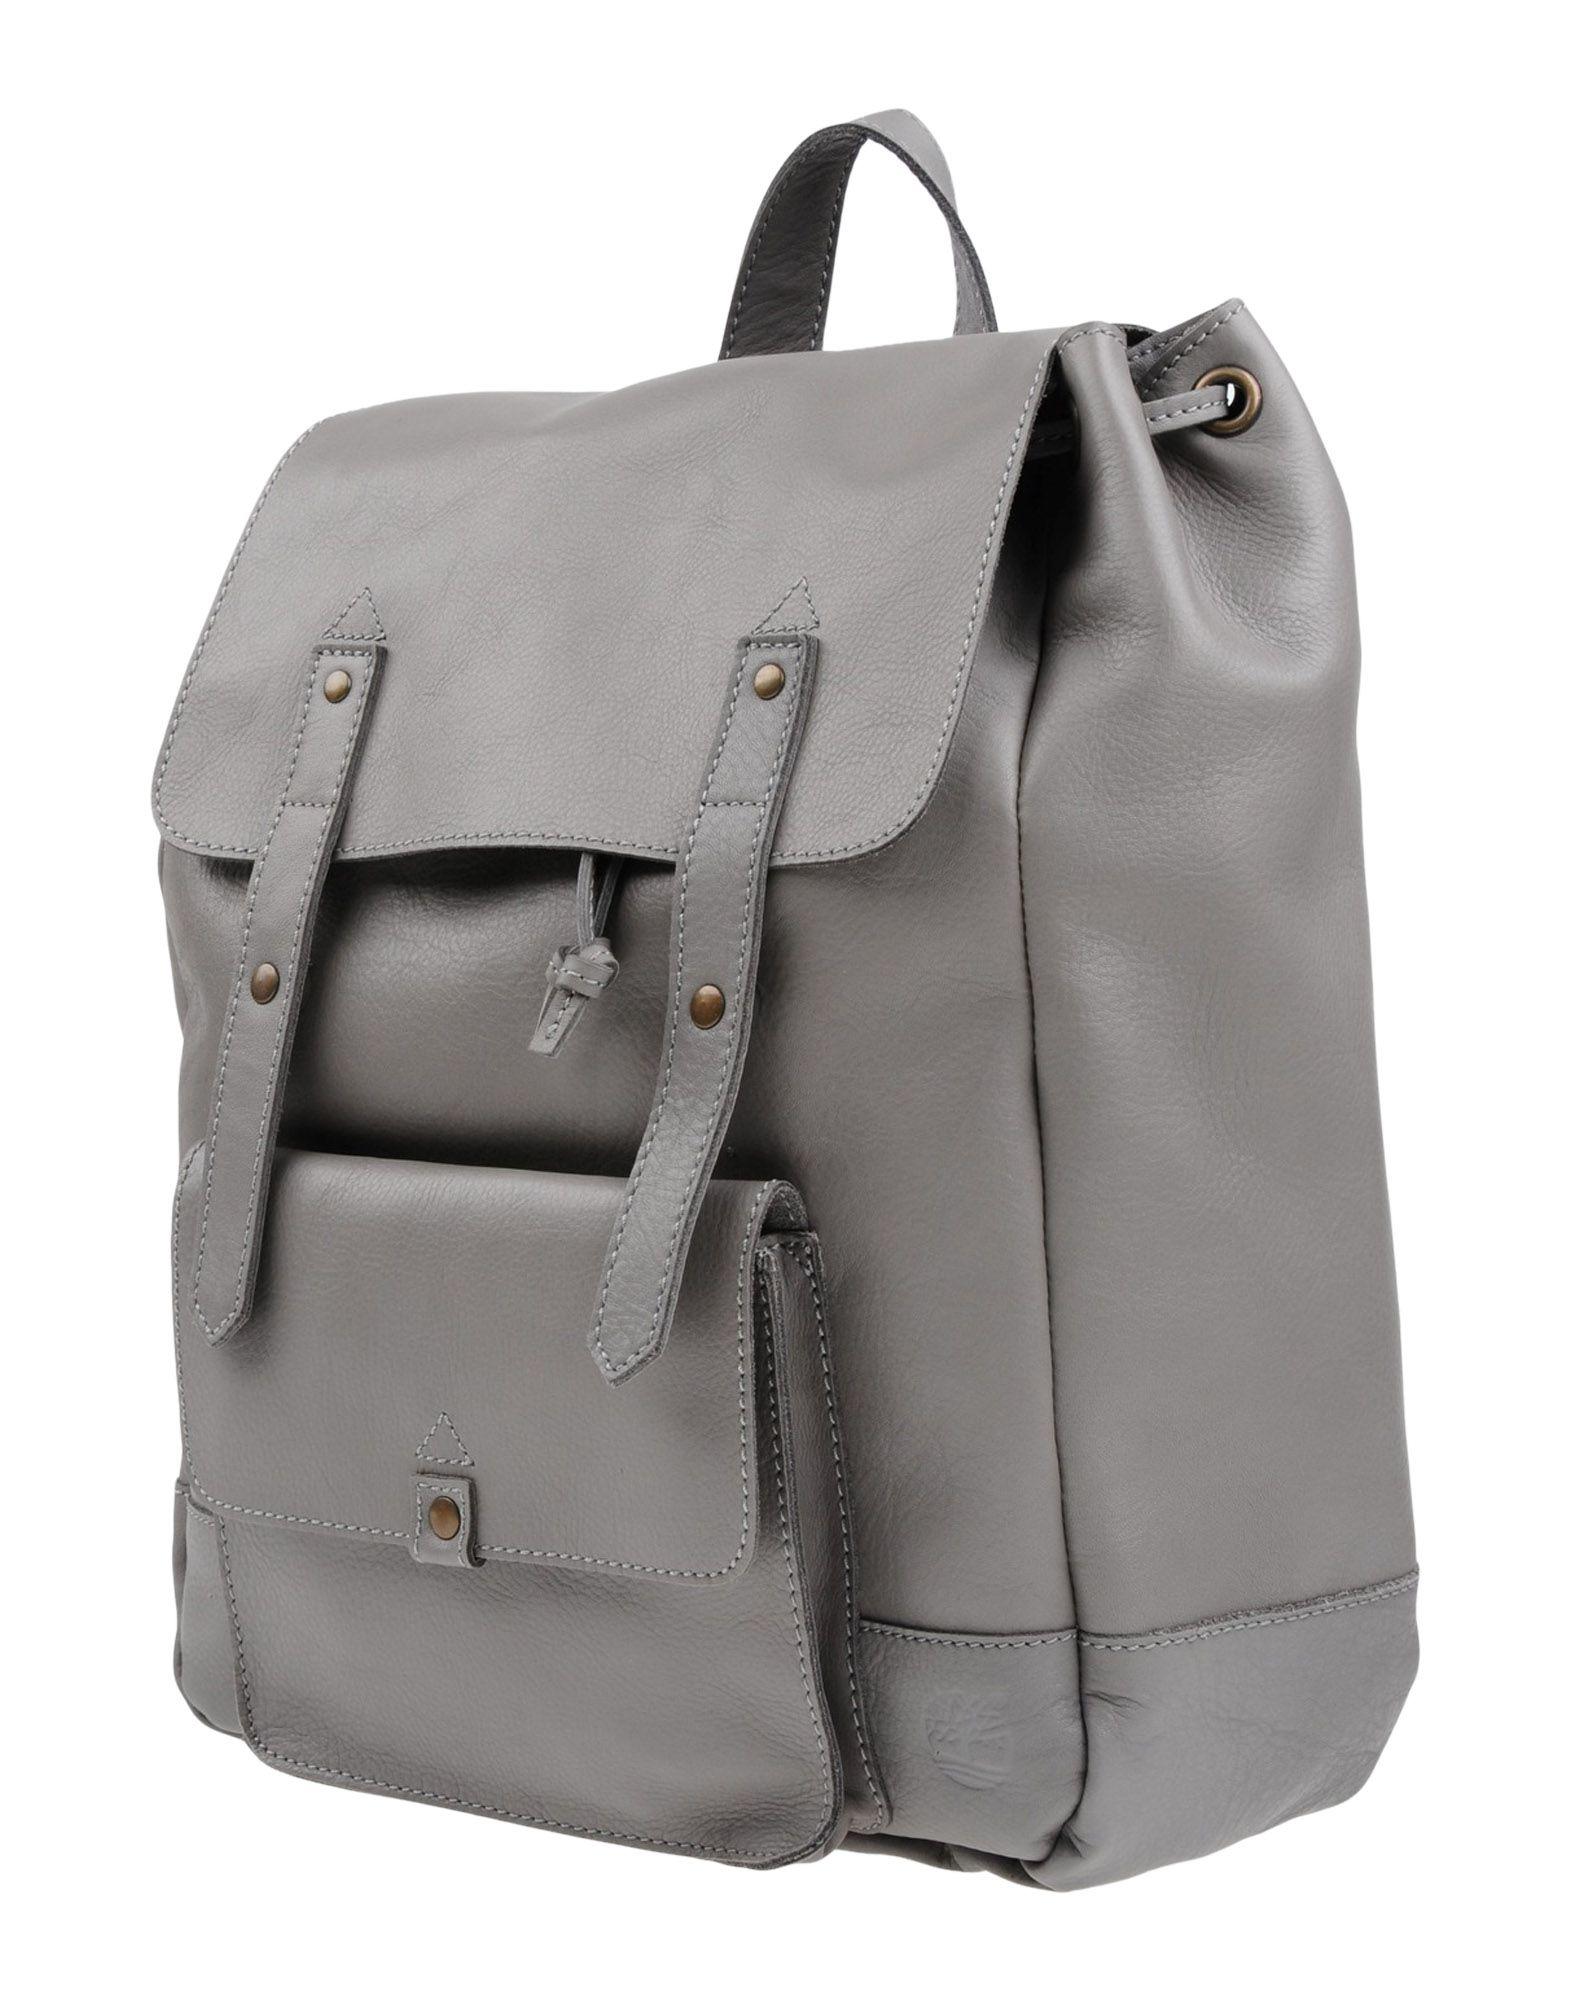 Umit Benan HANDBAGS - Backpacks & Fanny packs su YOOX.COM mC5WpYi